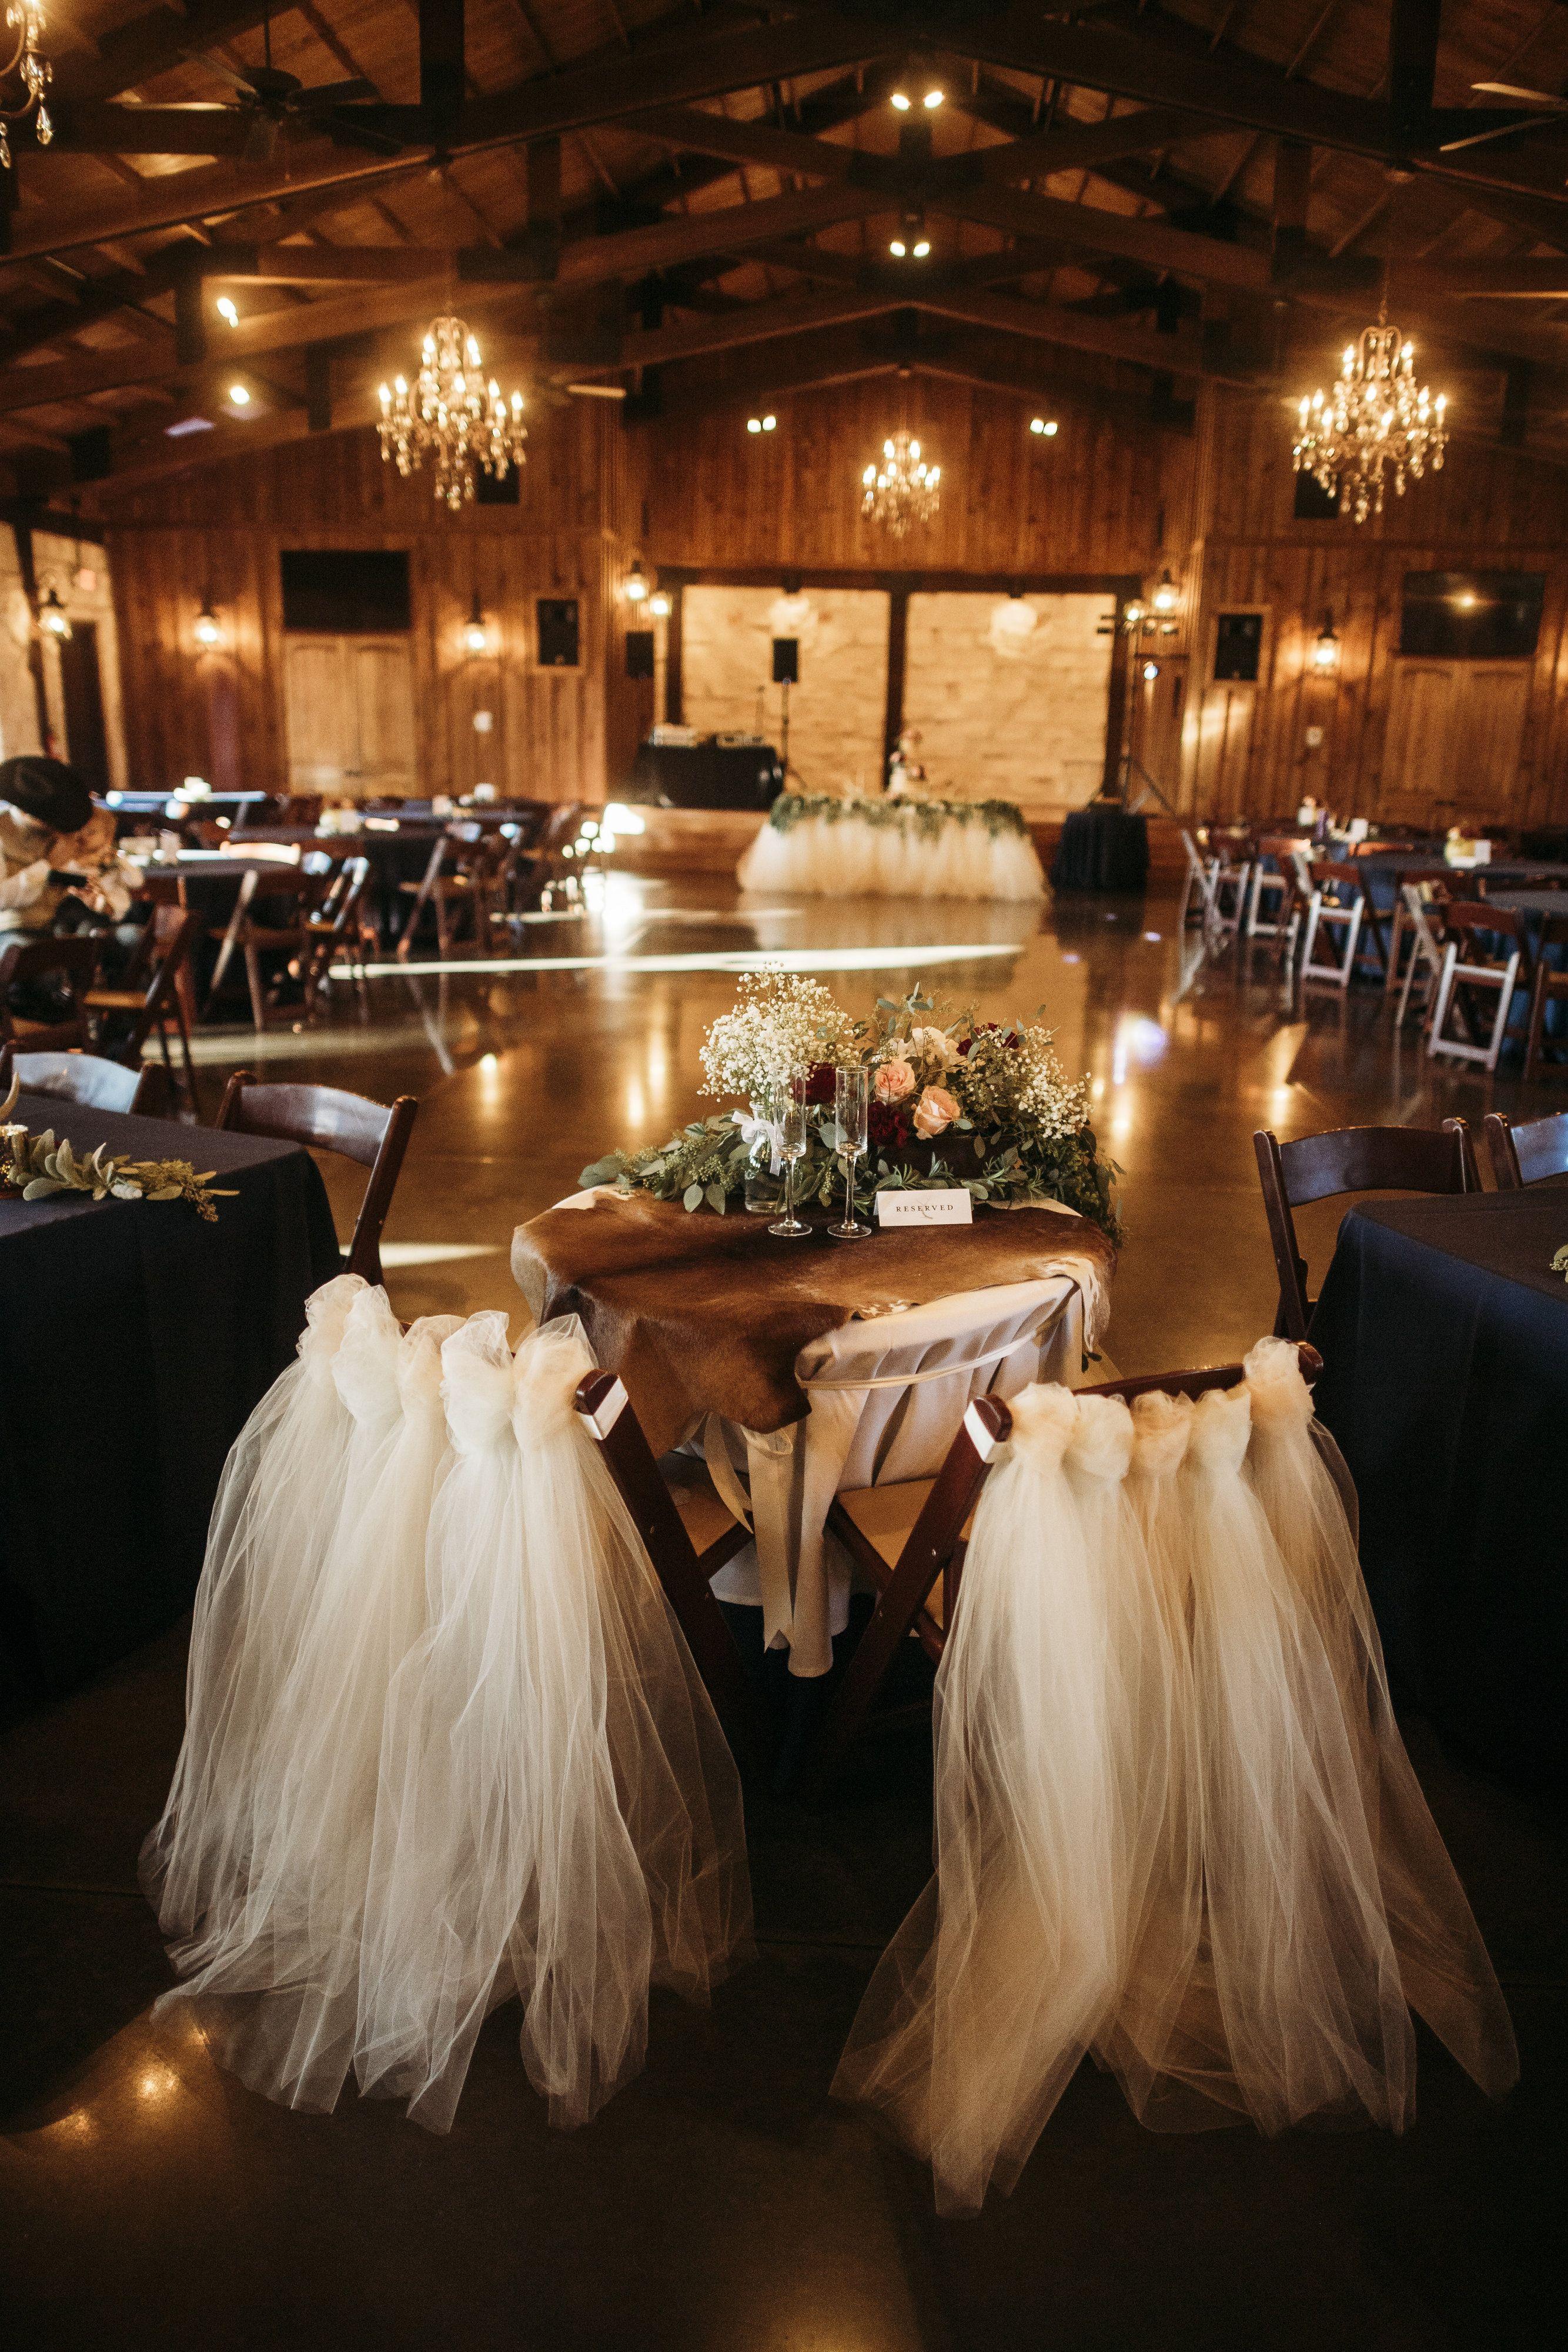 Wedding Venue Norman Oklahoma Sweetheart Table Decor Country